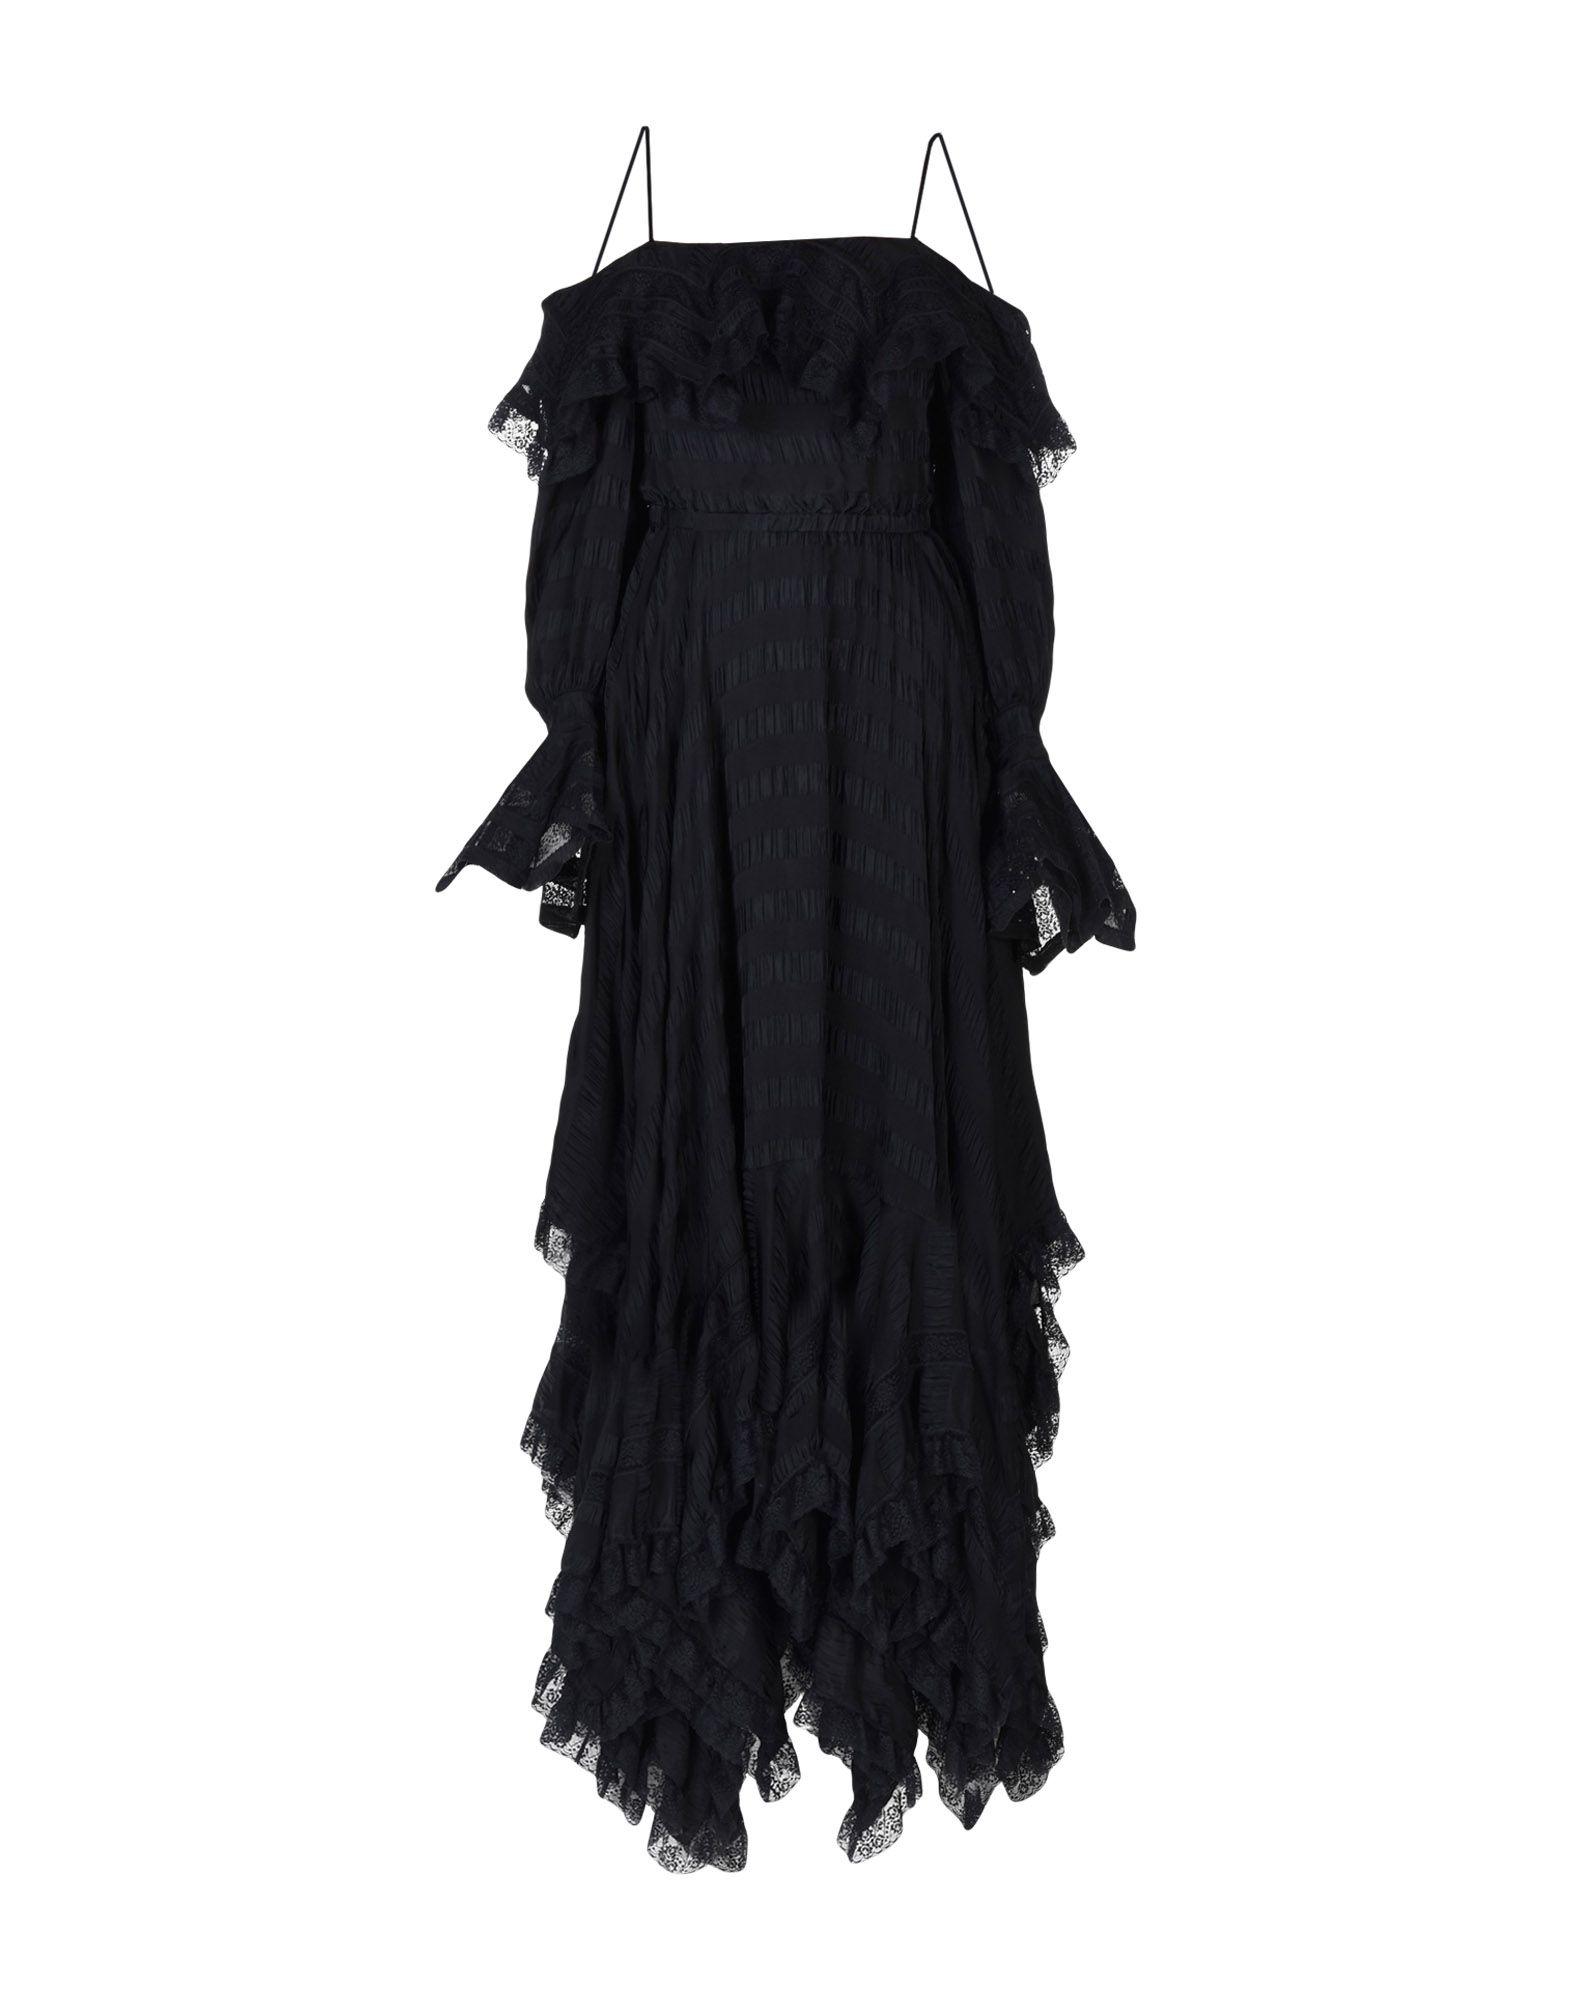 PHILOSOPHY di LORENZO SERAFINI Платье длиной 3/4 lisa corti платье длиной 3 4